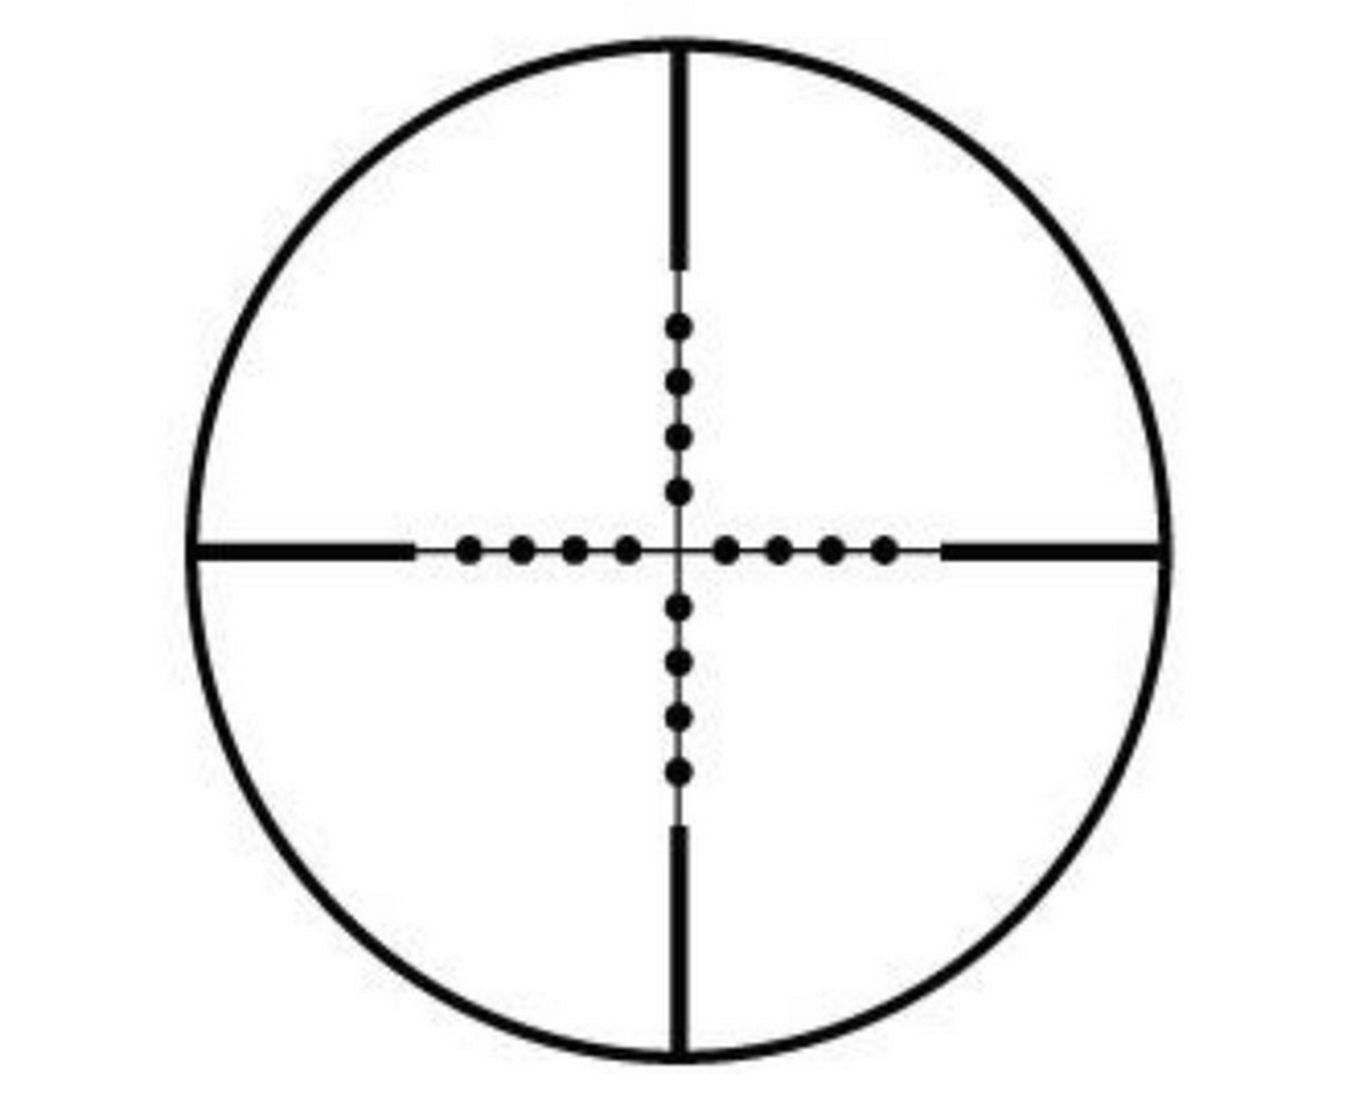 3 30x56 Tactical Rifle Scope Mil Dot Illuminated Reticle